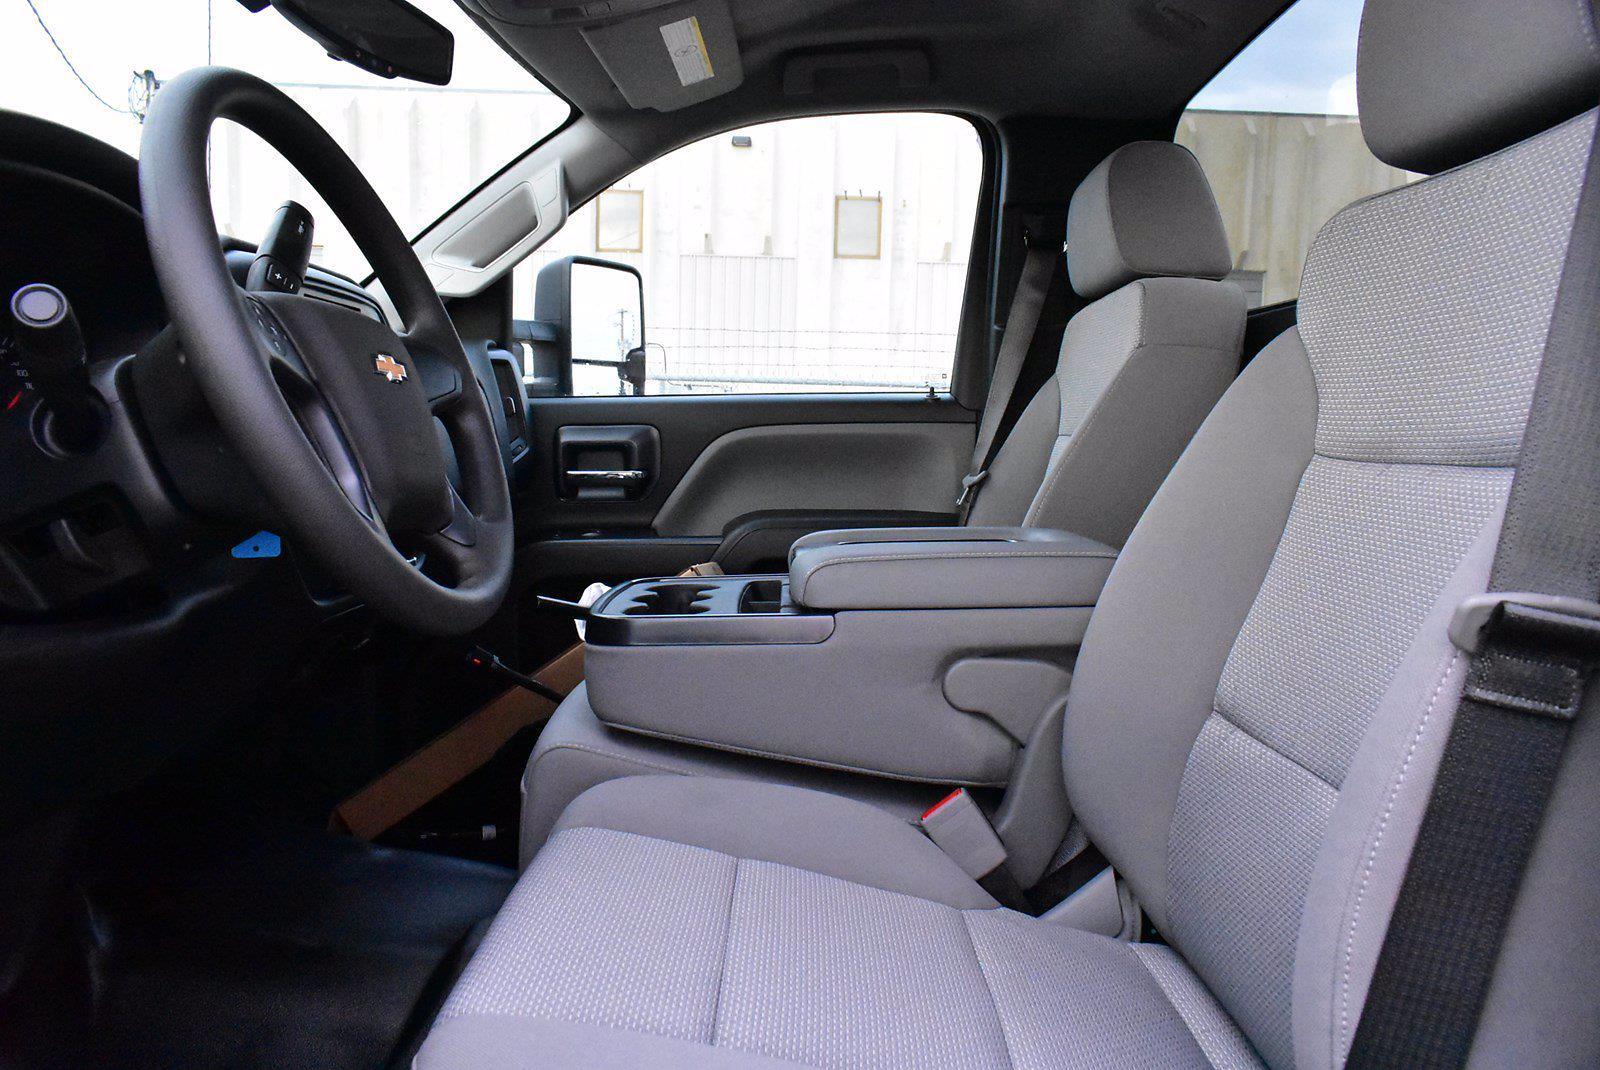 2020 Chevrolet Silverado 5500 DRW 4x2, Cab Chassis #D100217 - photo 8